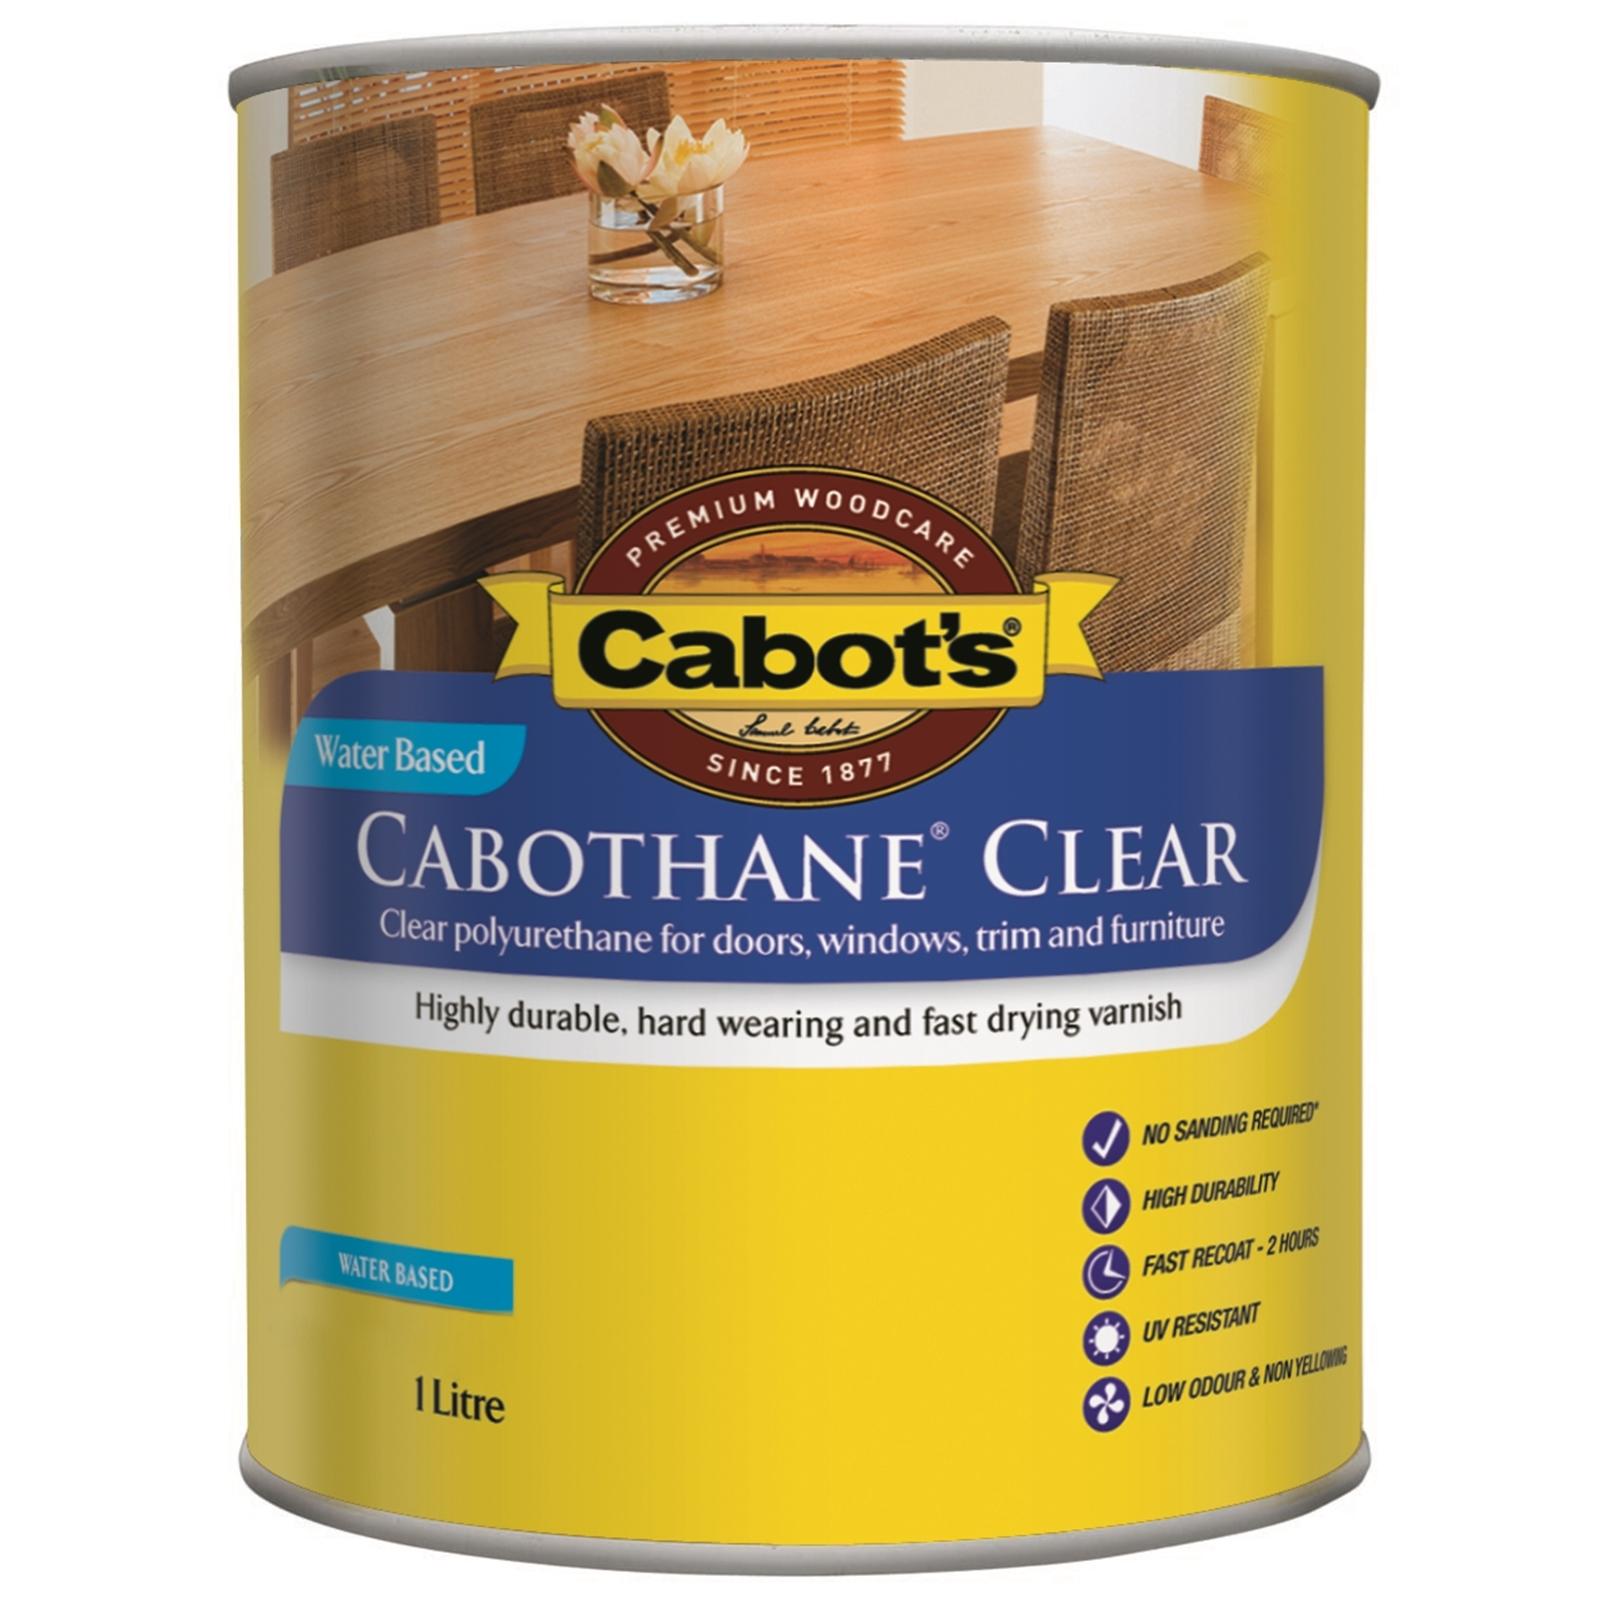 Cabot's 1L Water Based Matt Cabothane Clear Polyurethane Varnish